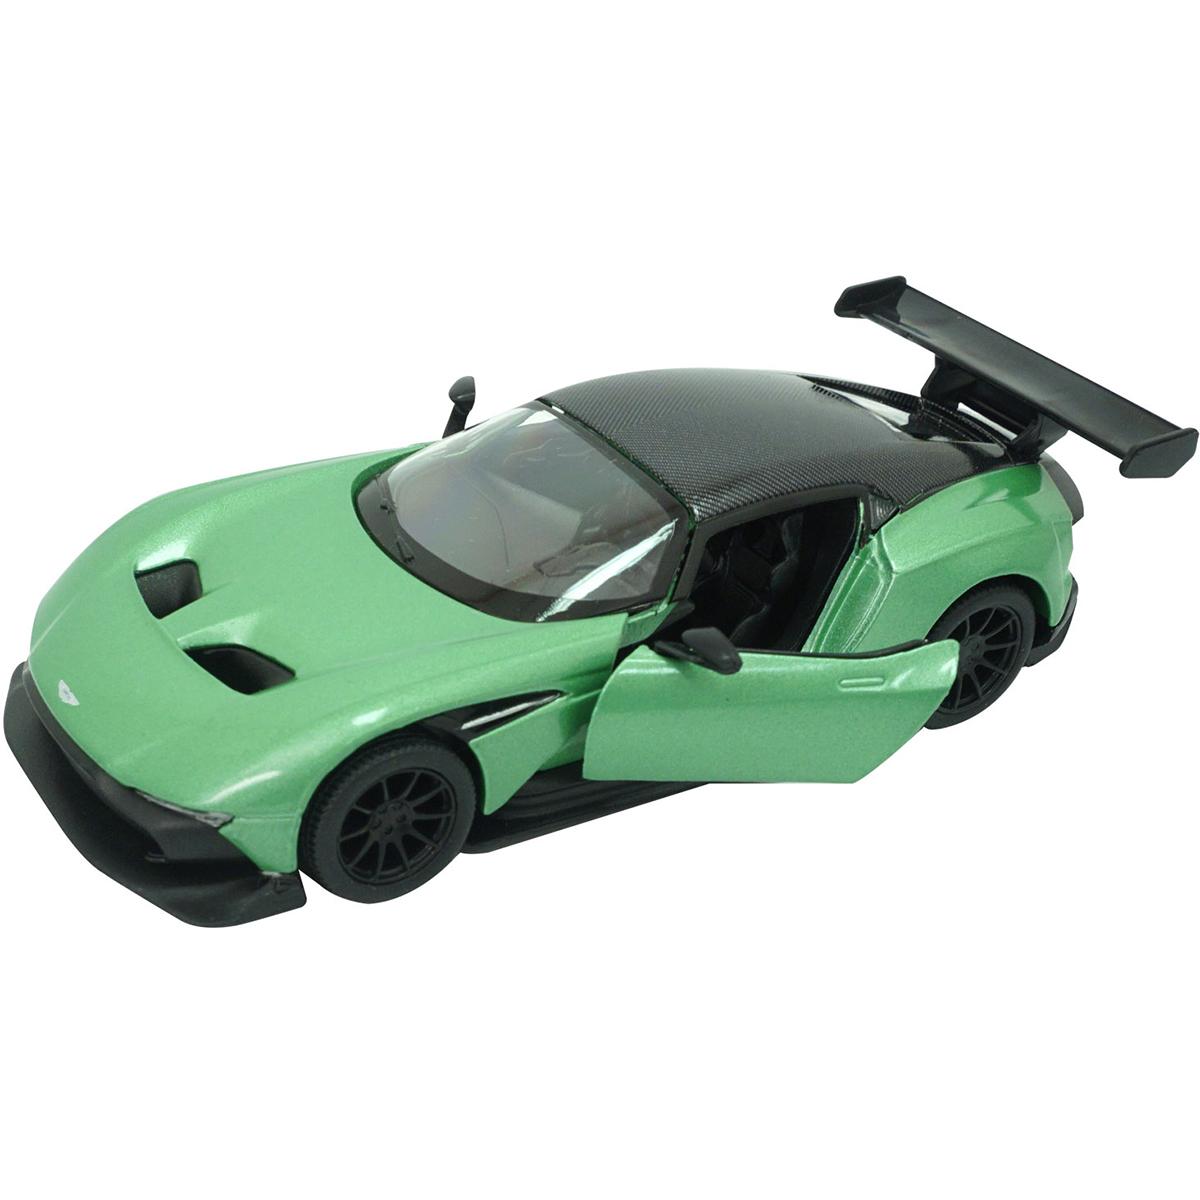 Masinuta din metal Kinsmart, Aston Martin Vulcan, Verde